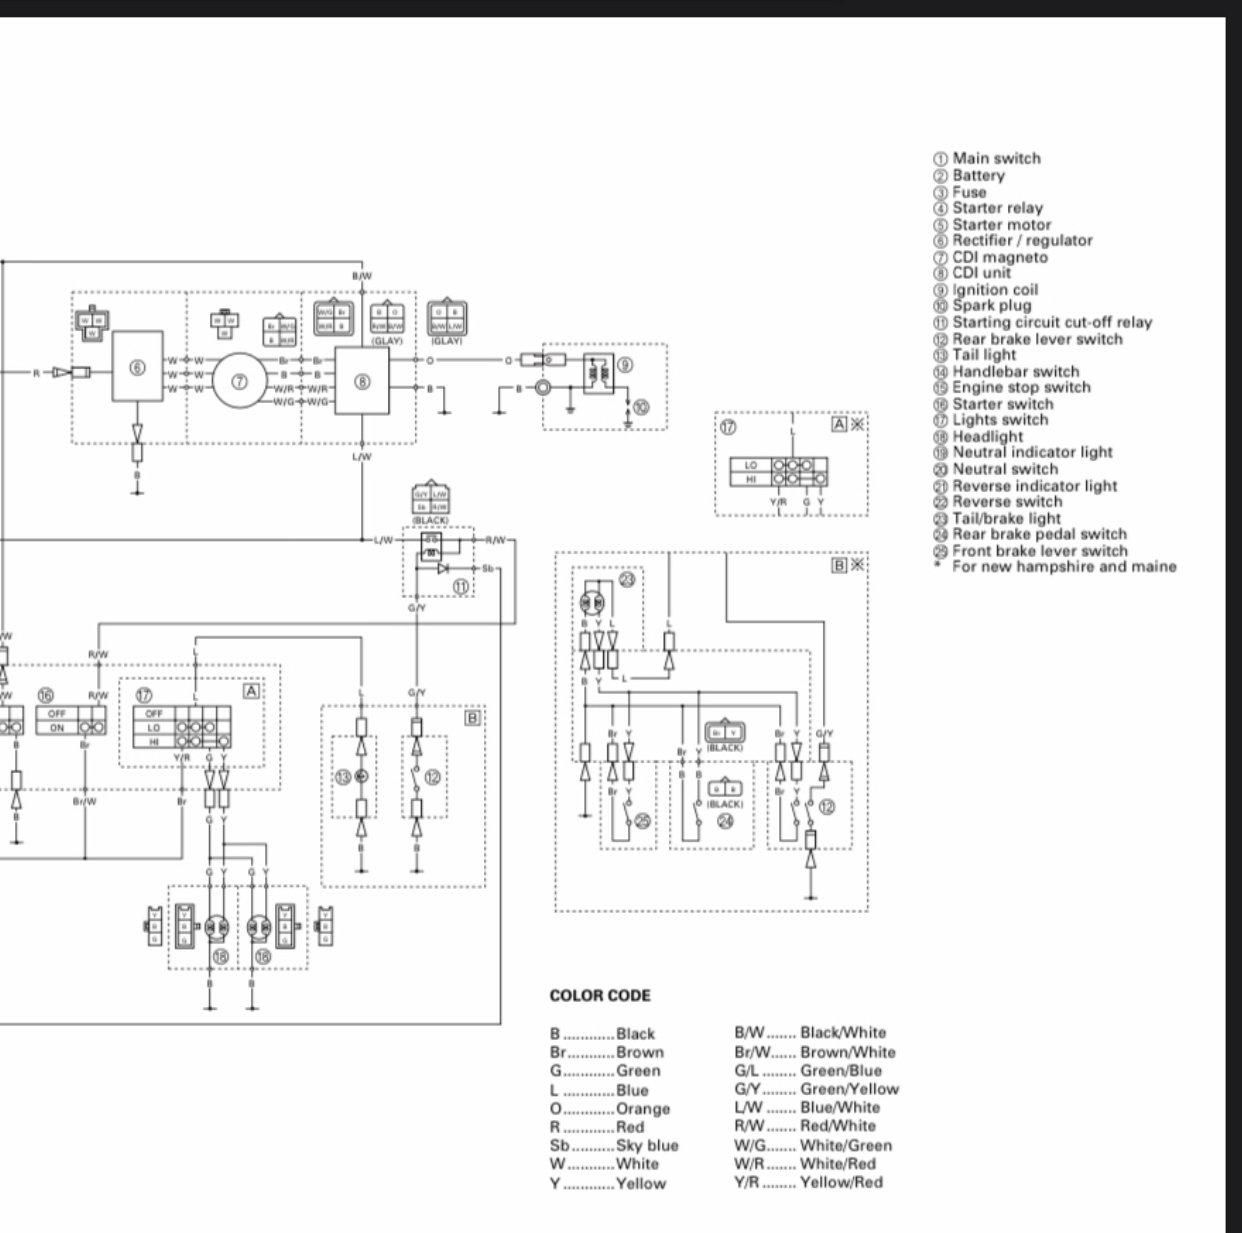 [DIAGRAM] 2001 Bear Tracker Wiring Diagram FULL Version HD